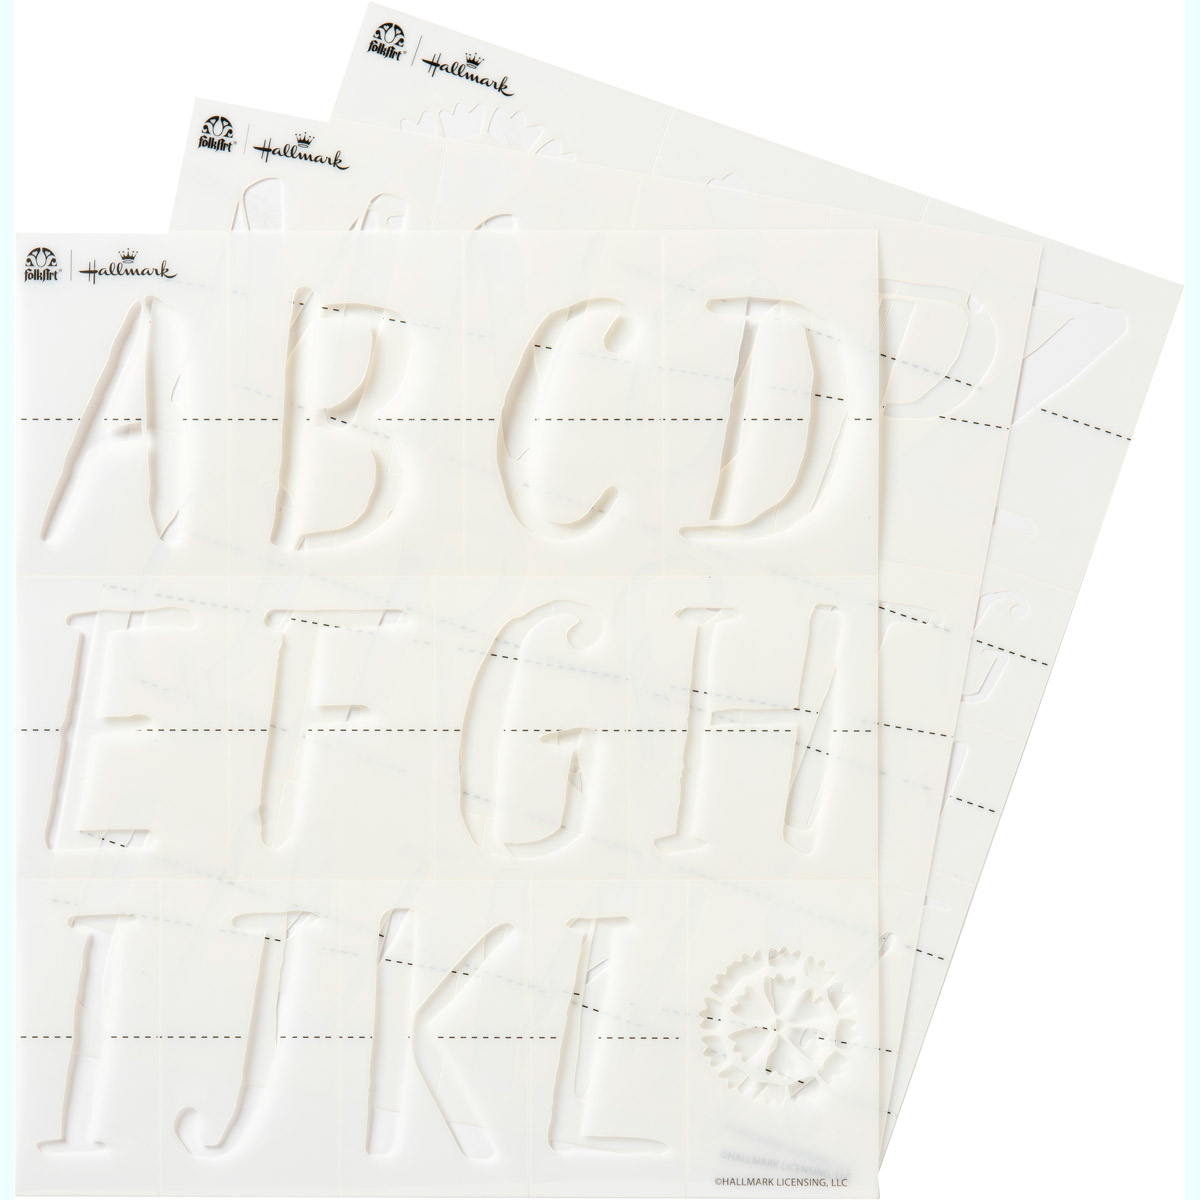 Hallmark Handcrafted Adhesive Stencils - Texture Font, 8-1/2